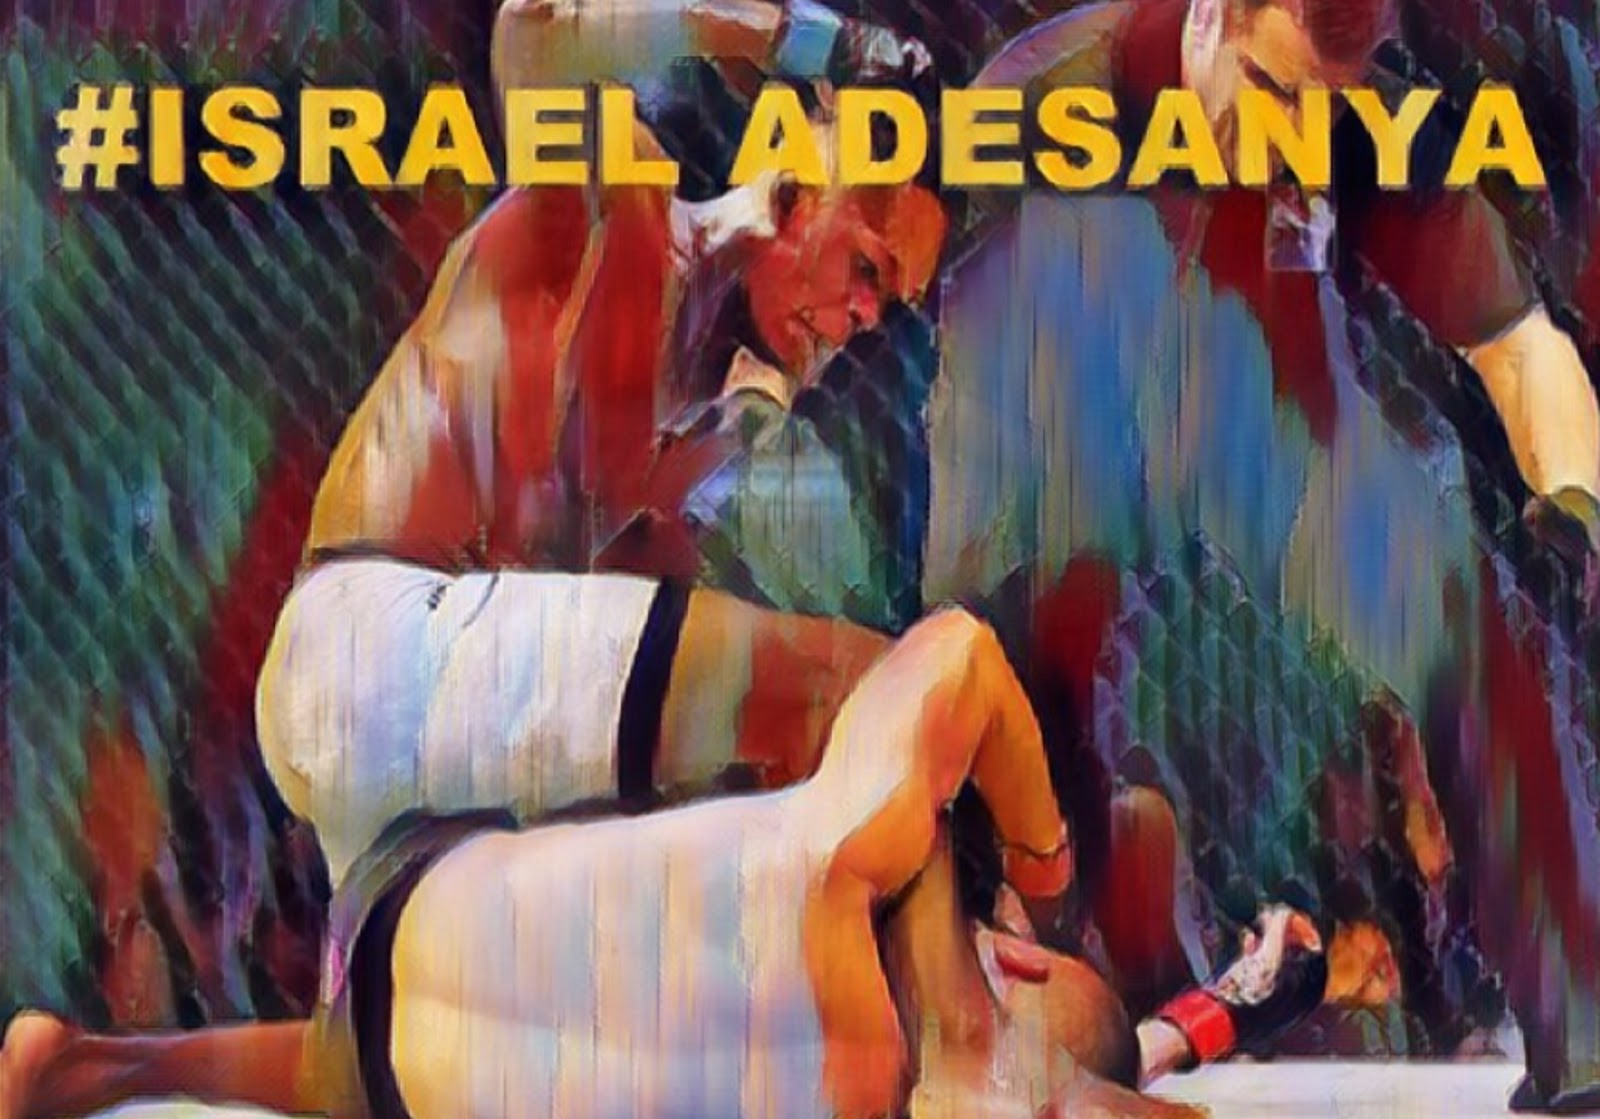 ISRAEL ADESANYA 2